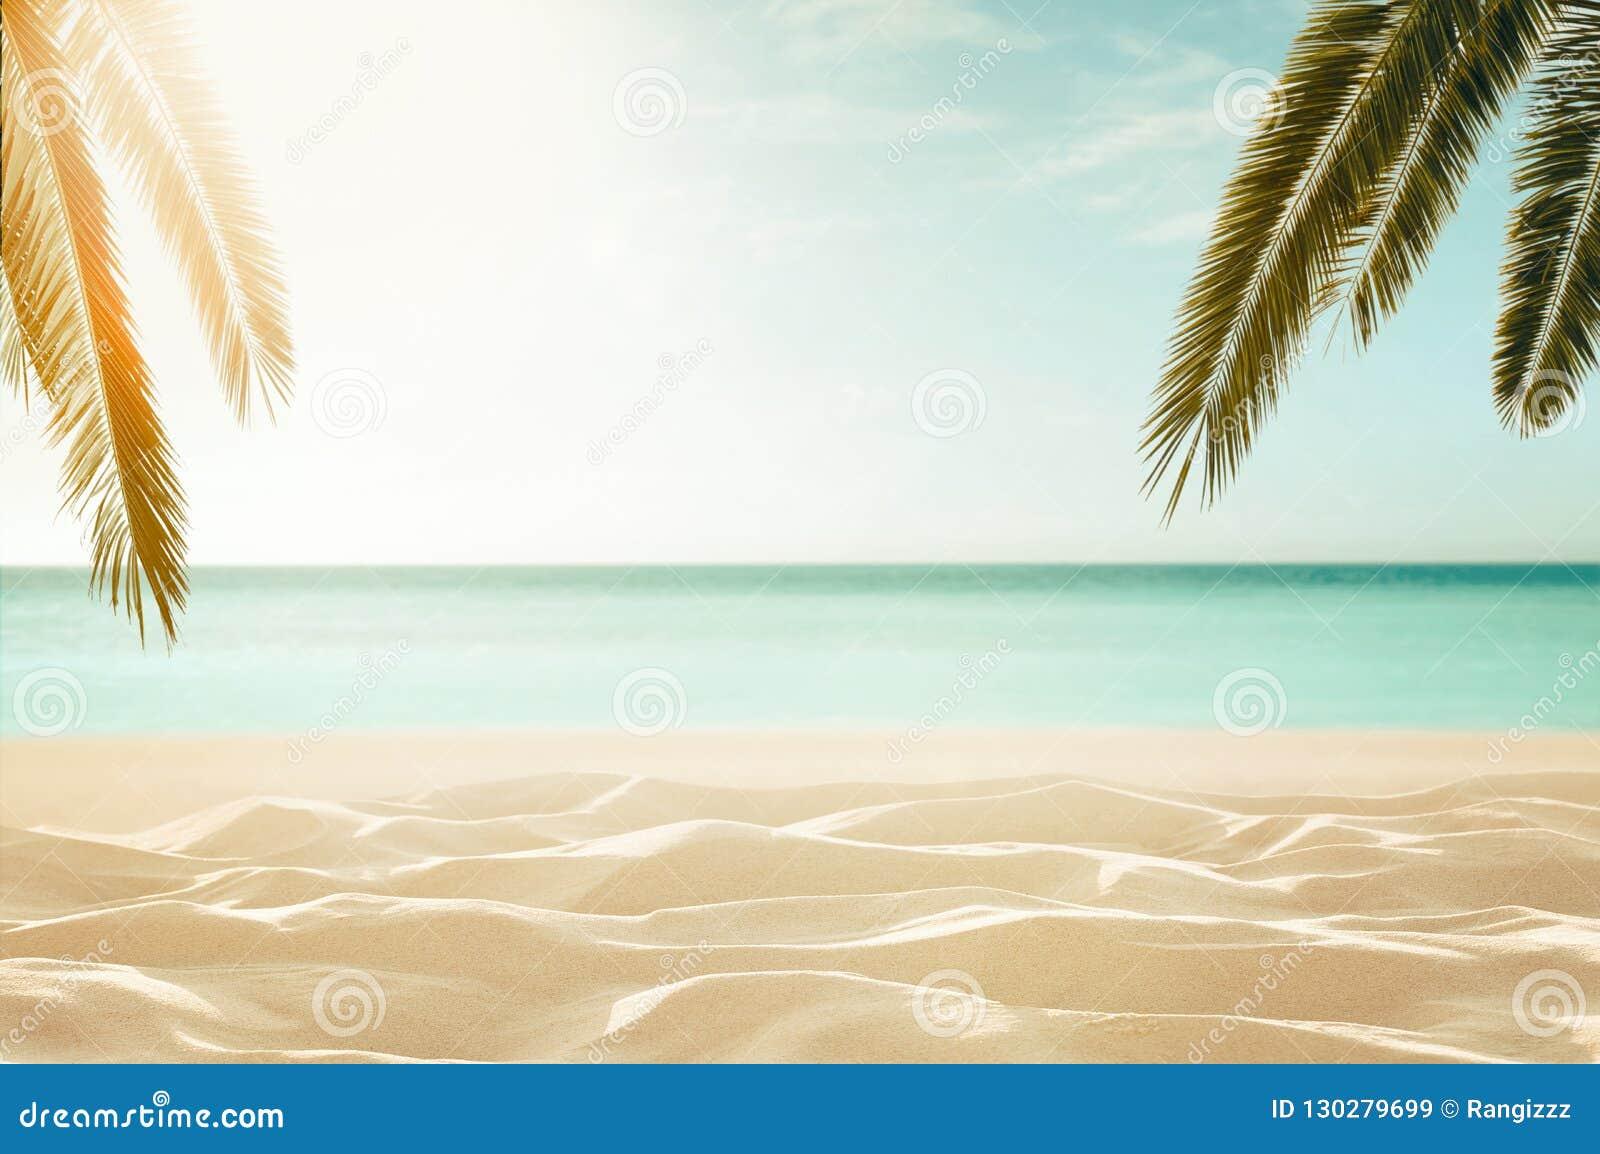 Empty, defocused tropical beach